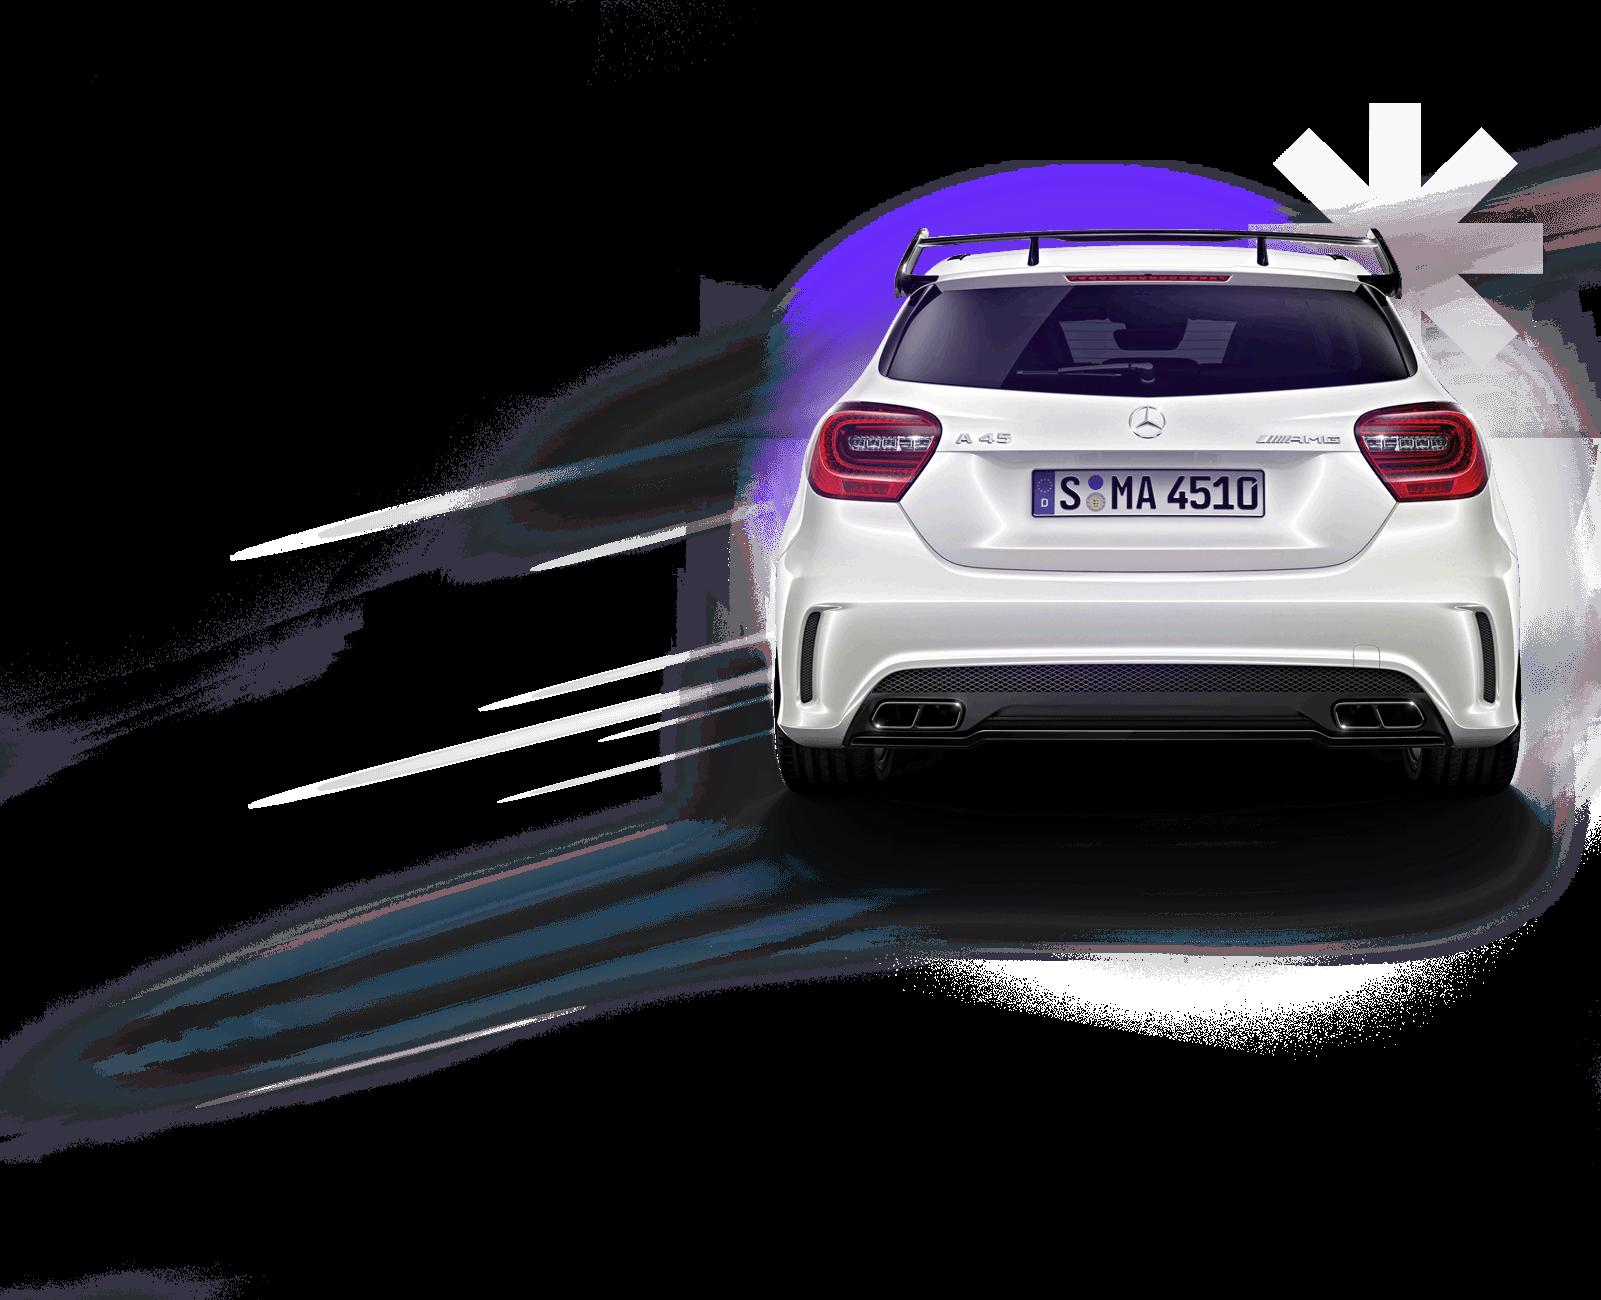 Download Mercedes Car Png Image HQ PNG Image   FreePNGImg